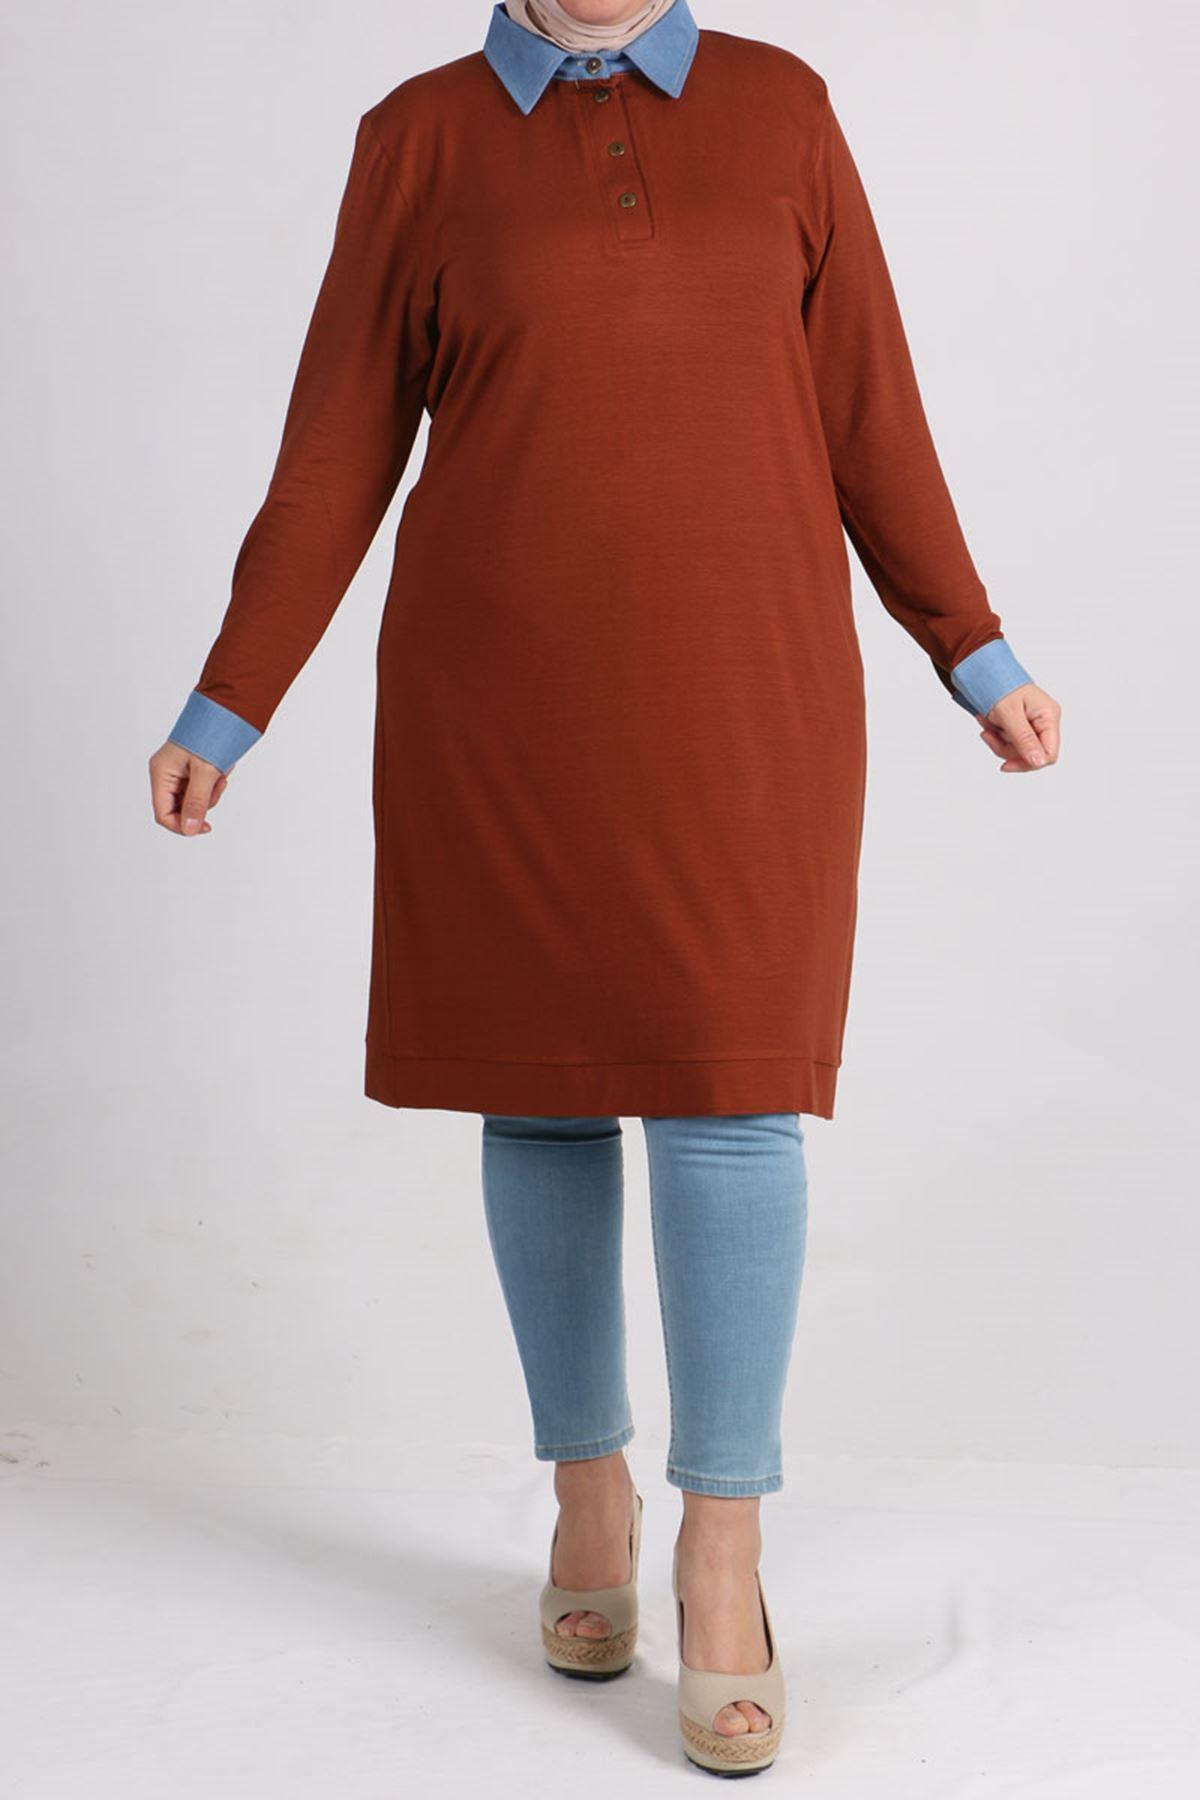 8453 Plus Size Tunic with Denim Neck - Terra Cotta